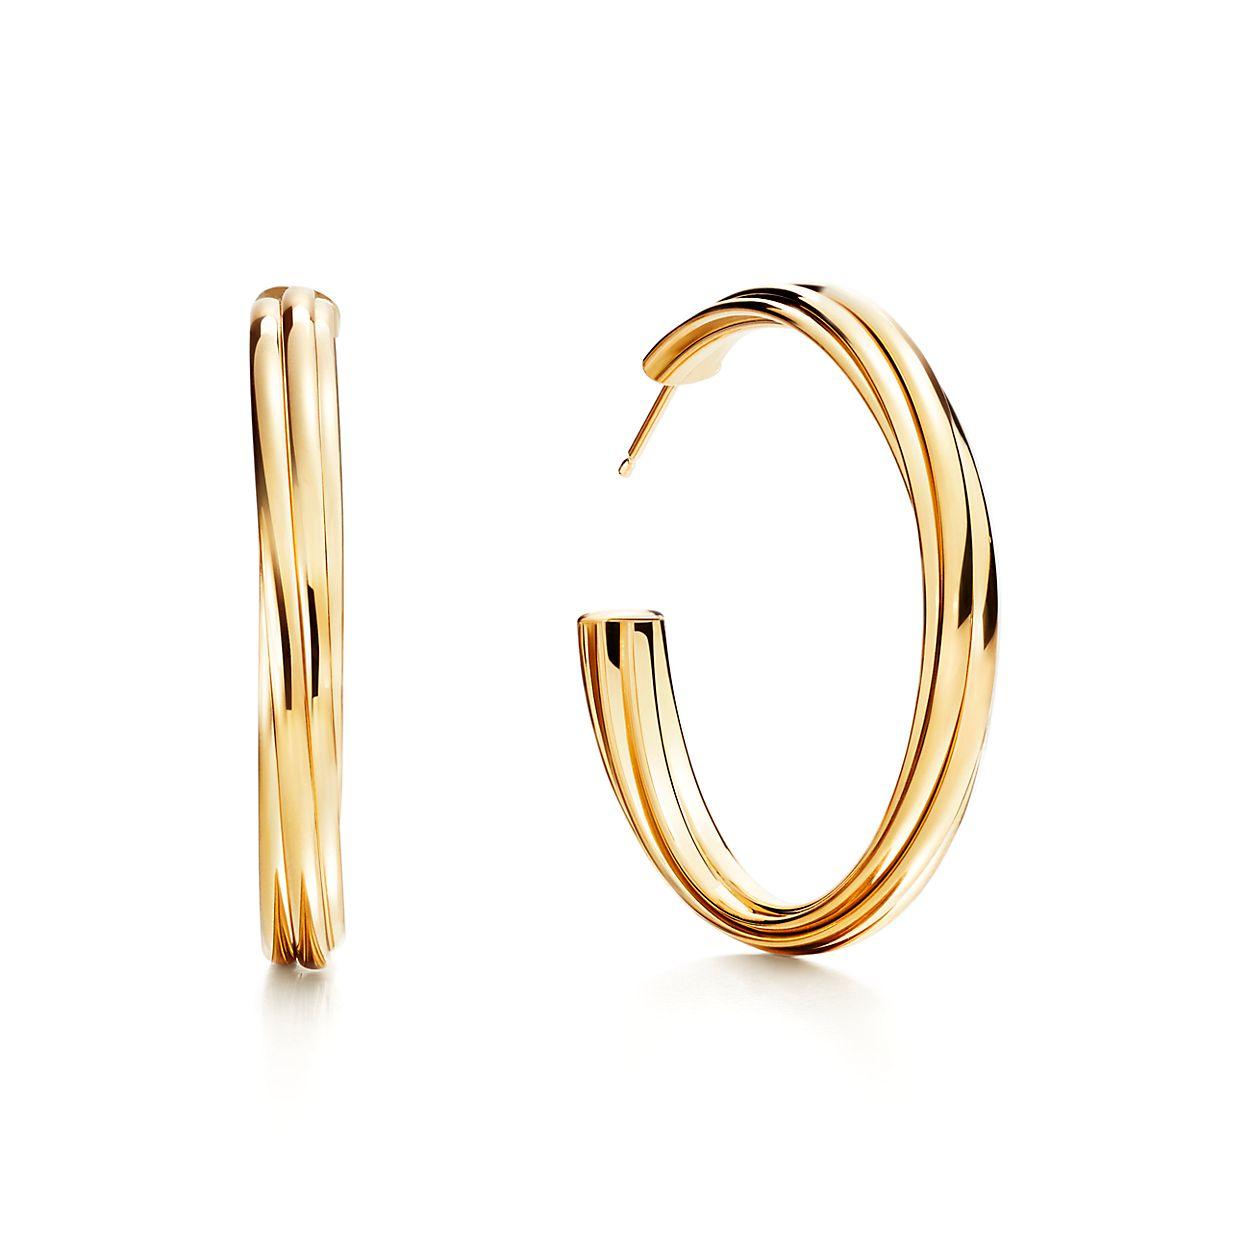 Paloma S Melody Hoop Earrings